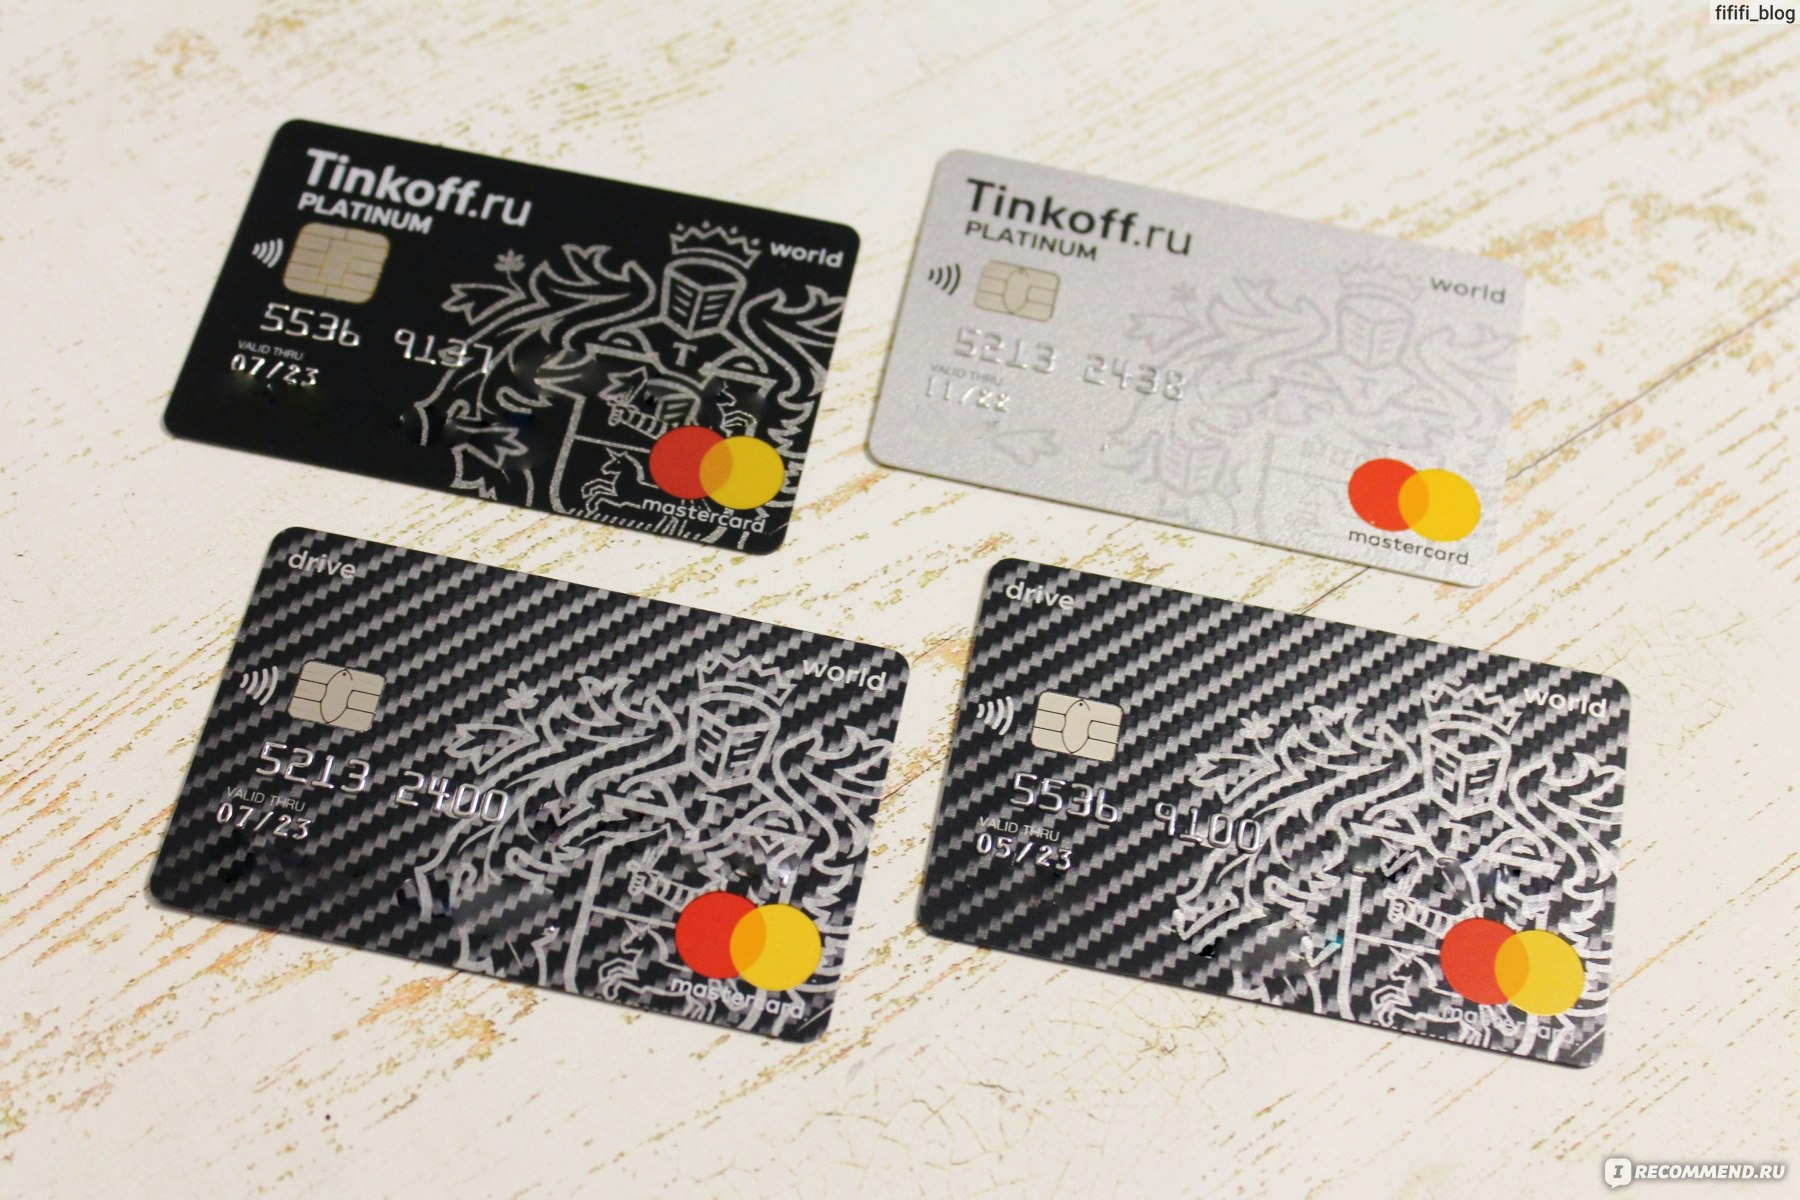 Кредит без отказа в набережных челнах